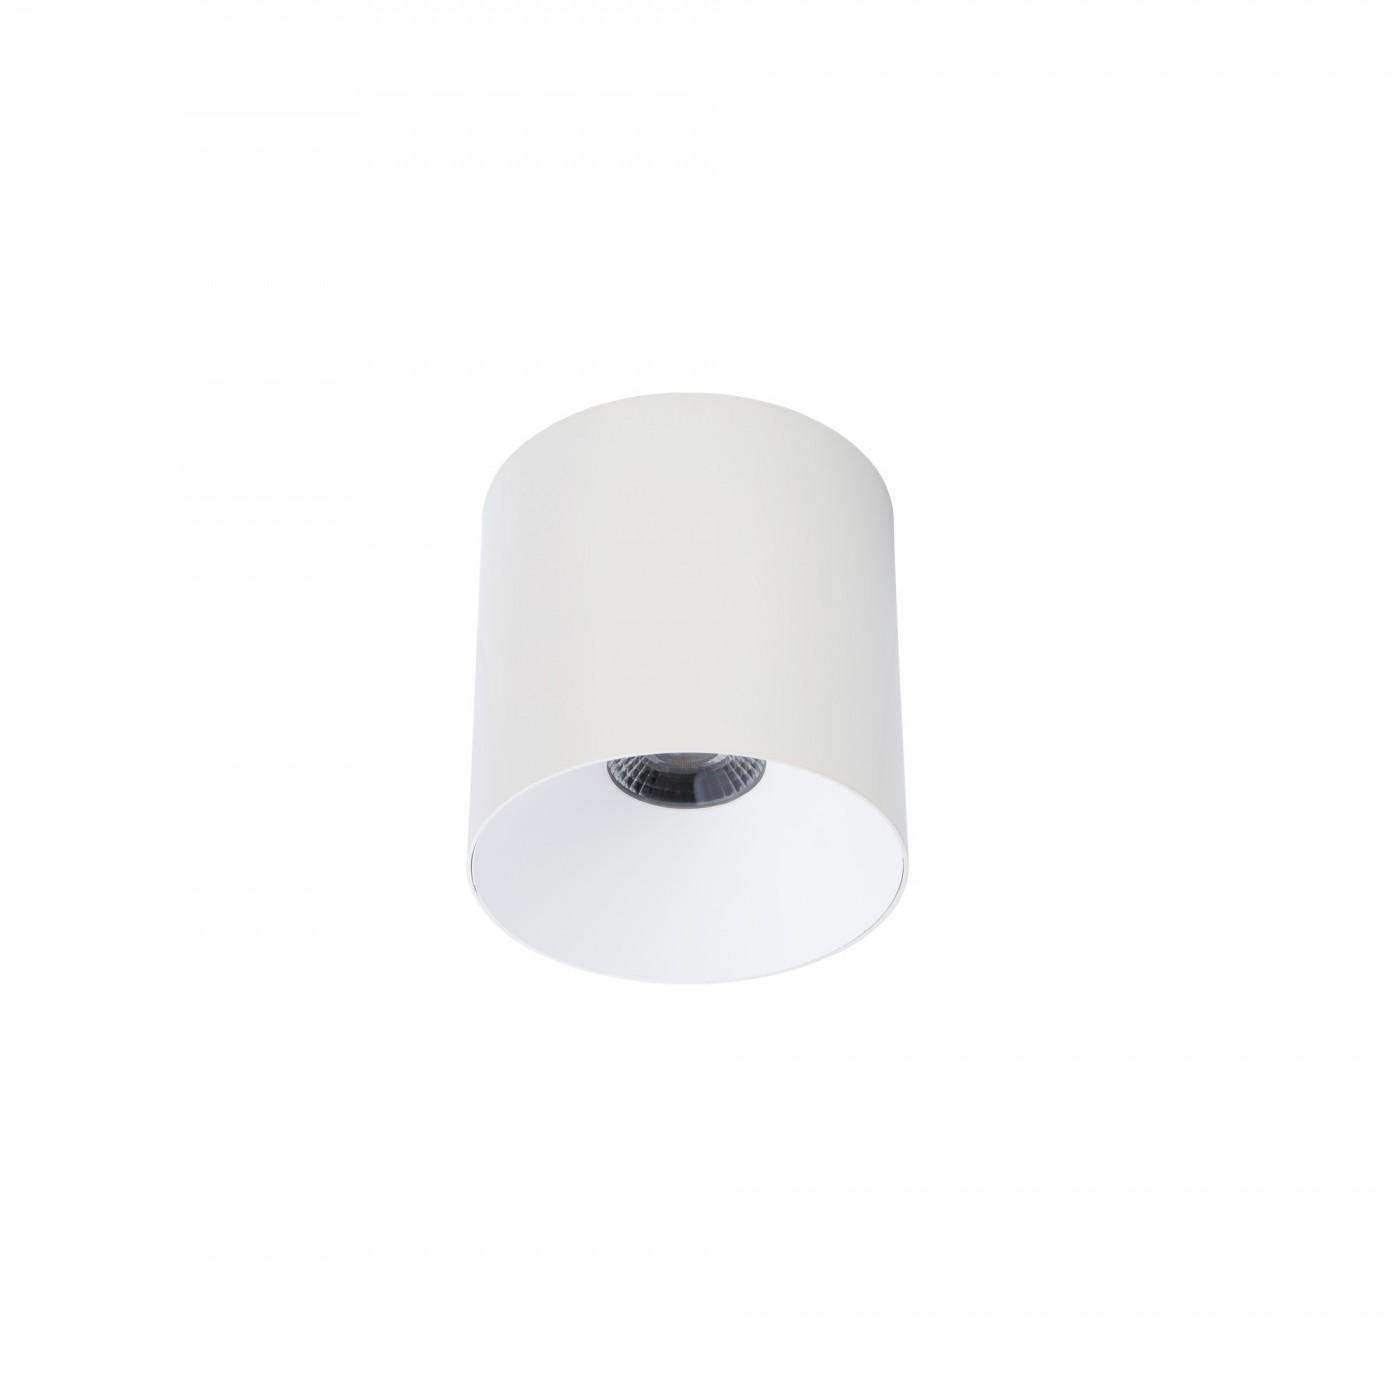 CL IOS LED 20W 4000K white 8738 Nowodvorski Lighting